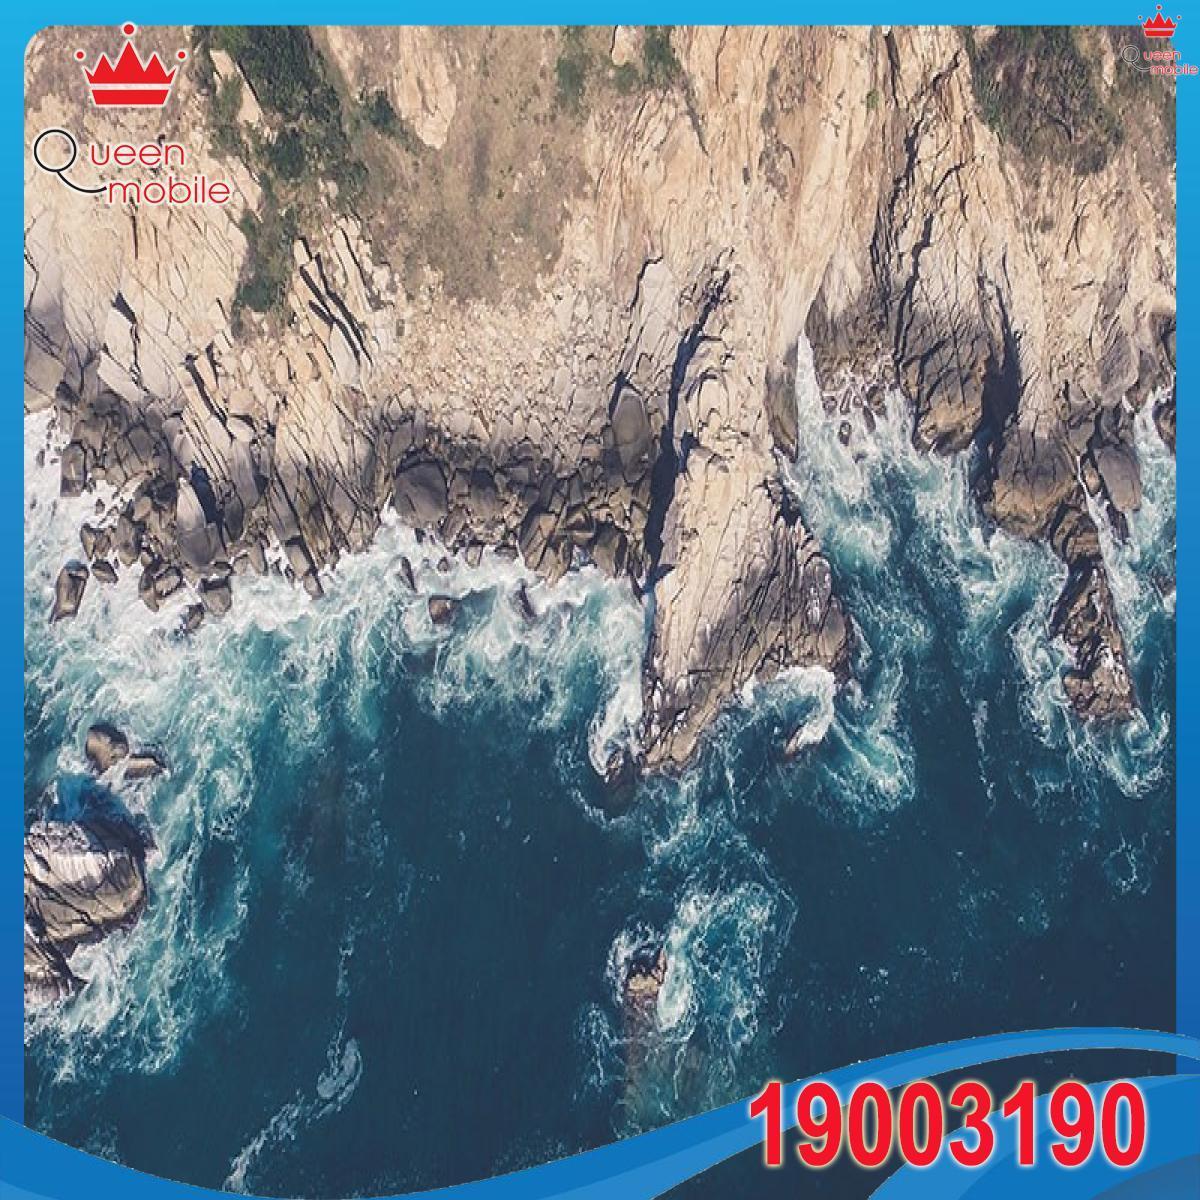 island-sea-blue-mountain-wave-nature-imac-27